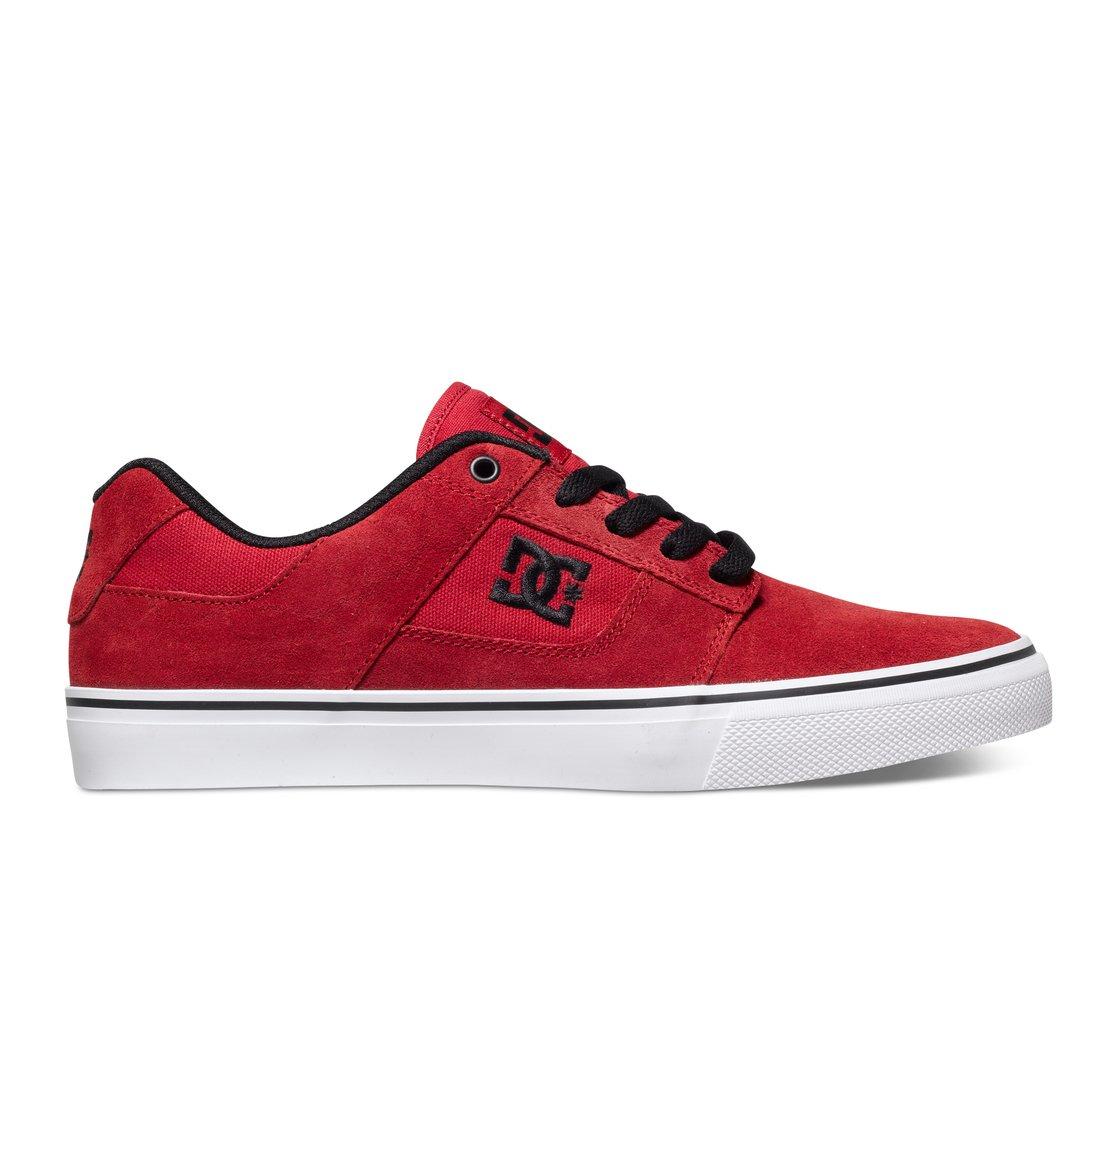 b8f76e5d5f7 0 Tênis masculino Bridge Vermelho BR320096 DC Shoes